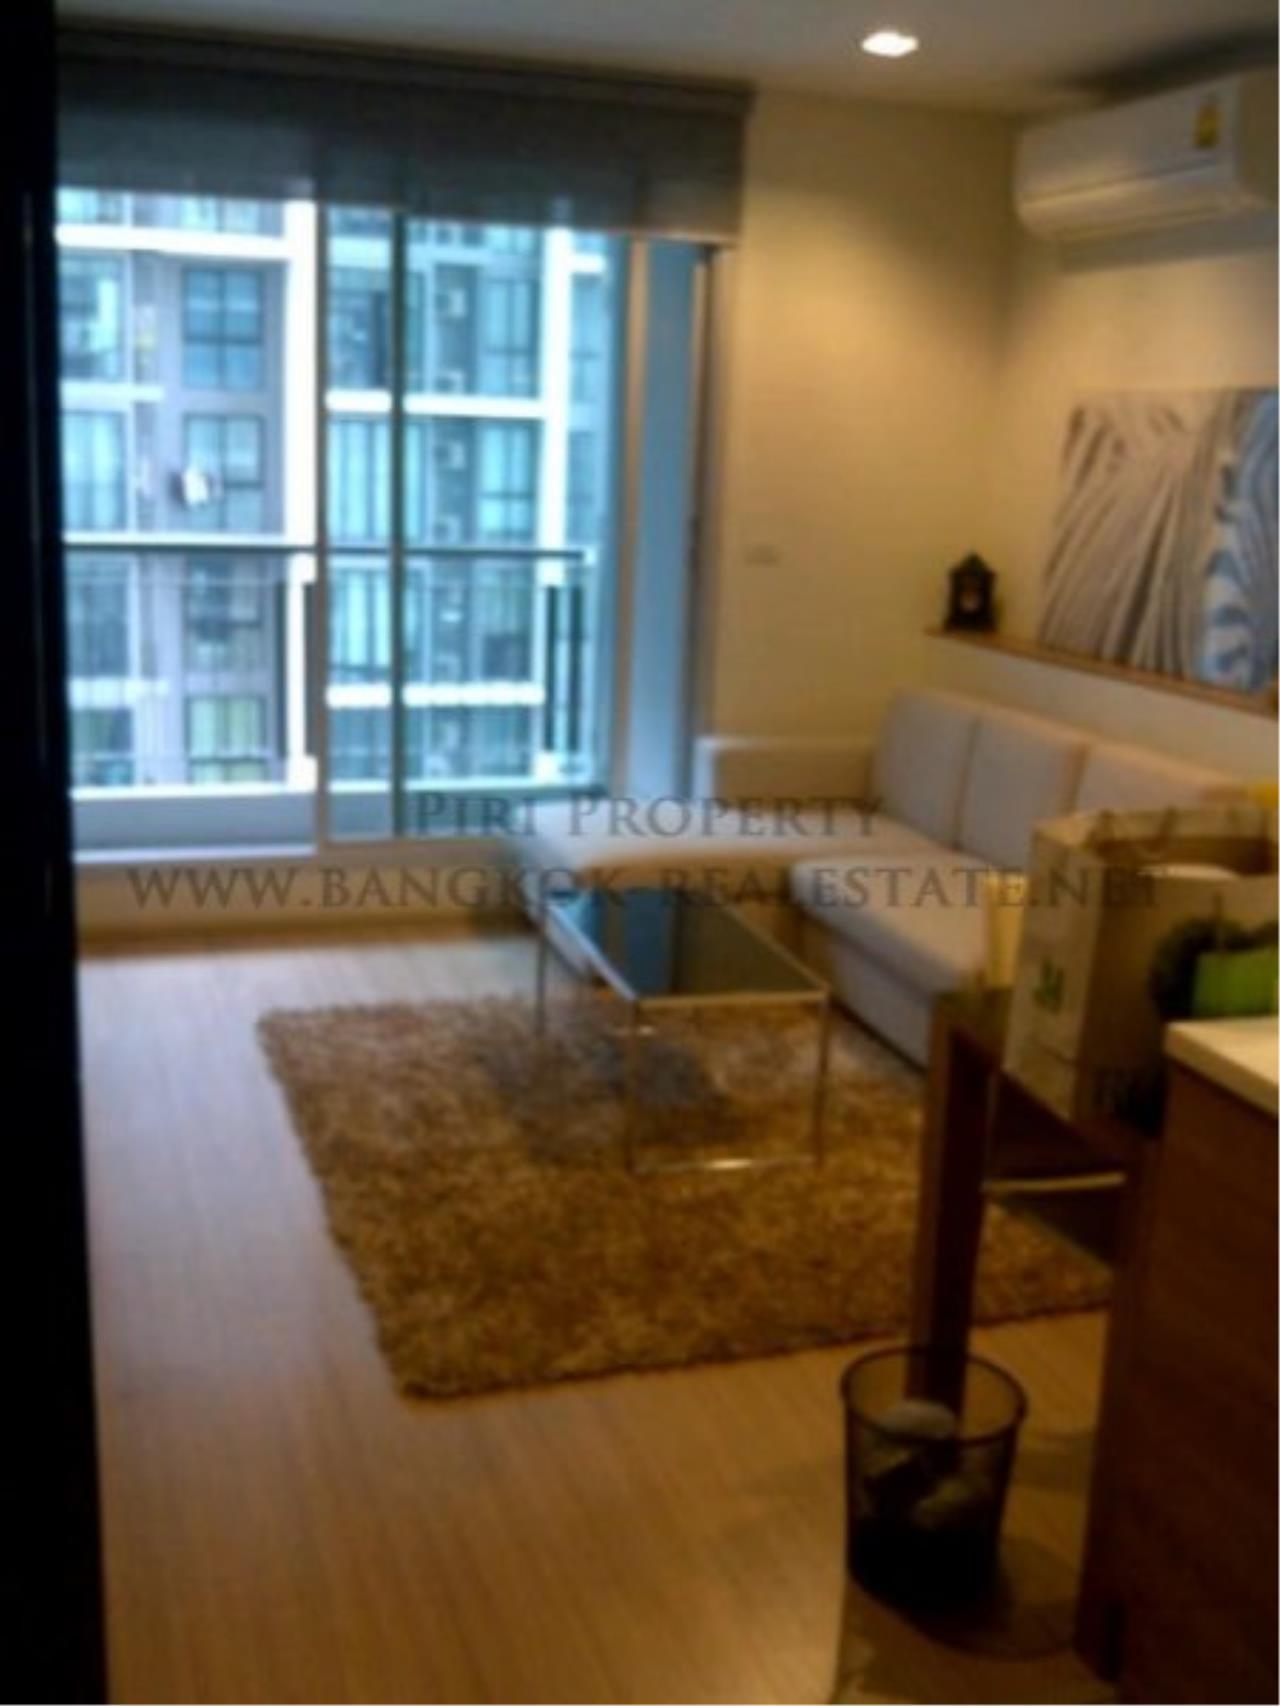 Piri Property Agency's Rhythm Ratchada - Huay Kwang - modern 1 Bedroom Condo for Rent 4